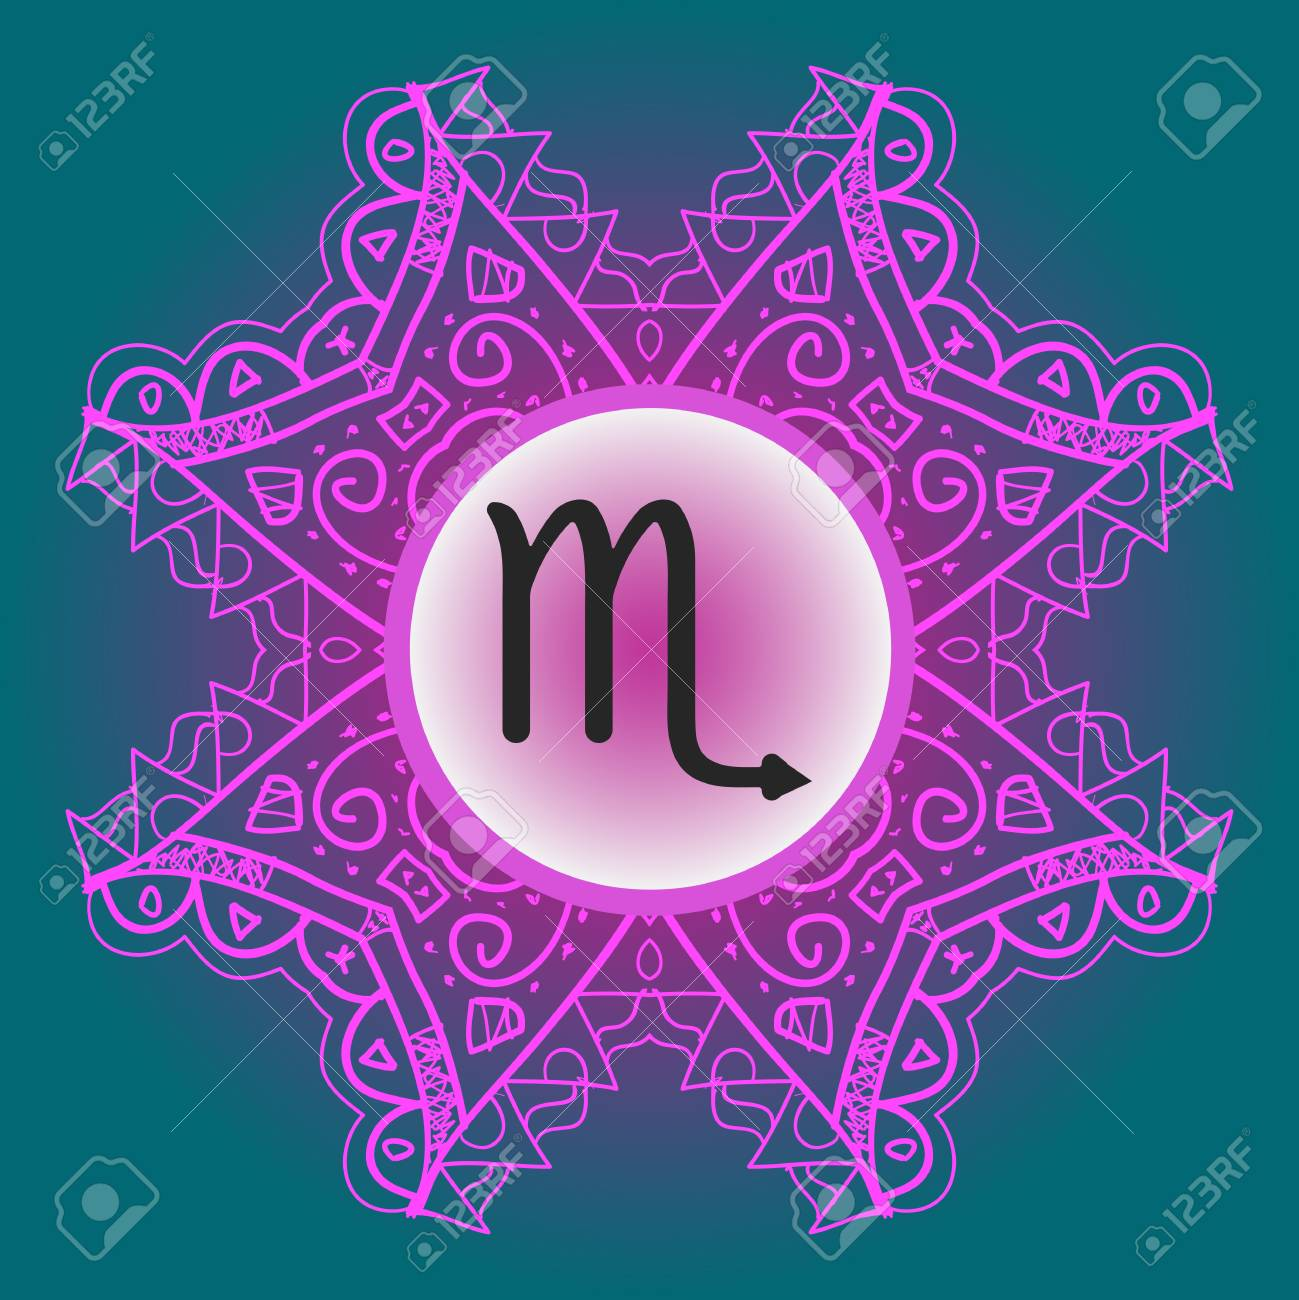 Vector - zodiac sign Scorpio - What is karma Vector circle with zodiac signs on ornate wallpaper. Oriental mandala motif square lase pattern, like snowflake ...